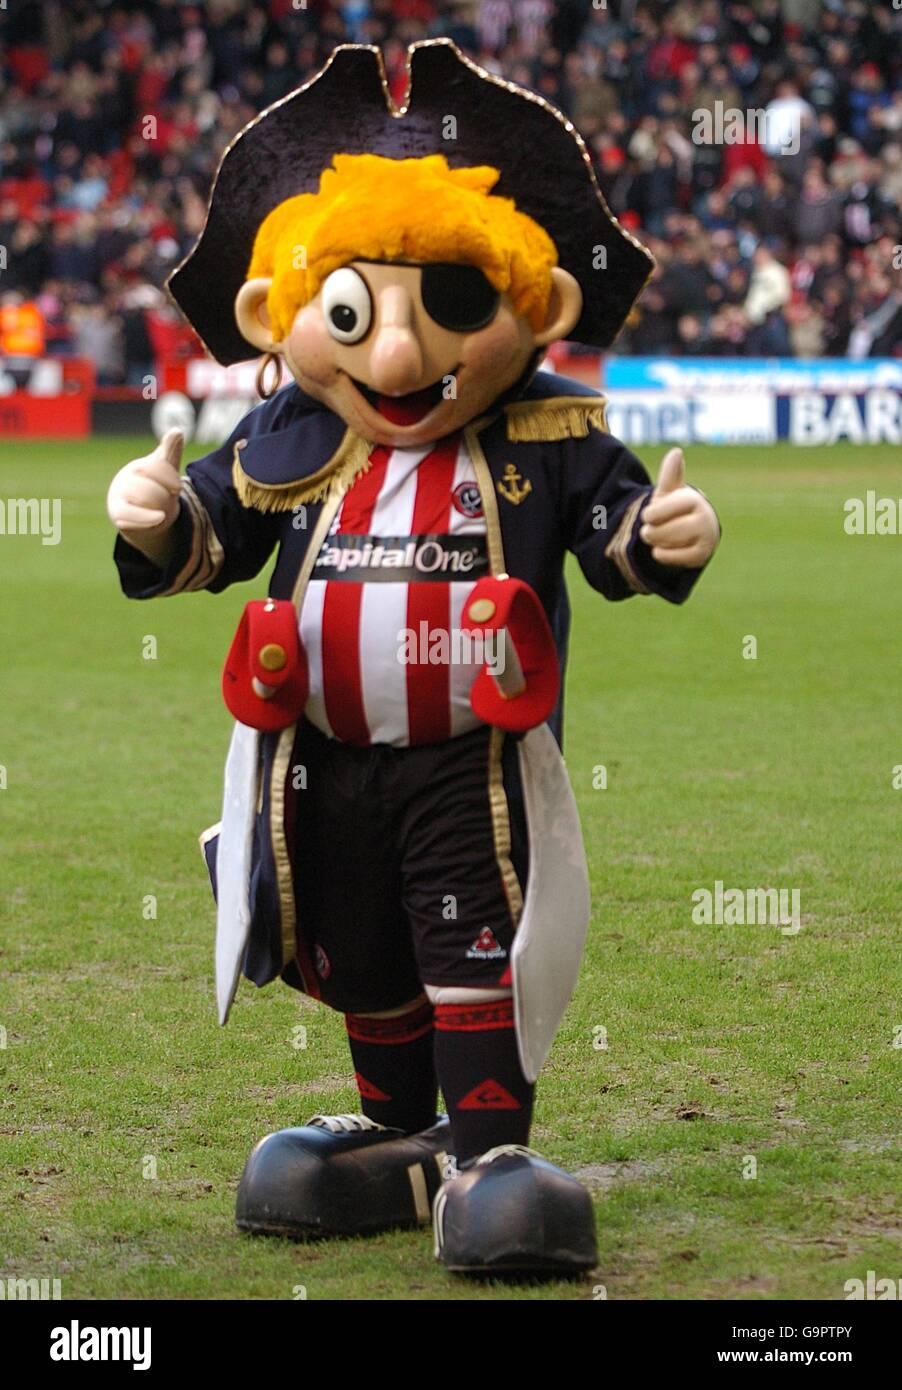 Sheffield United Mascot Stock Photos & Sheffield United ...